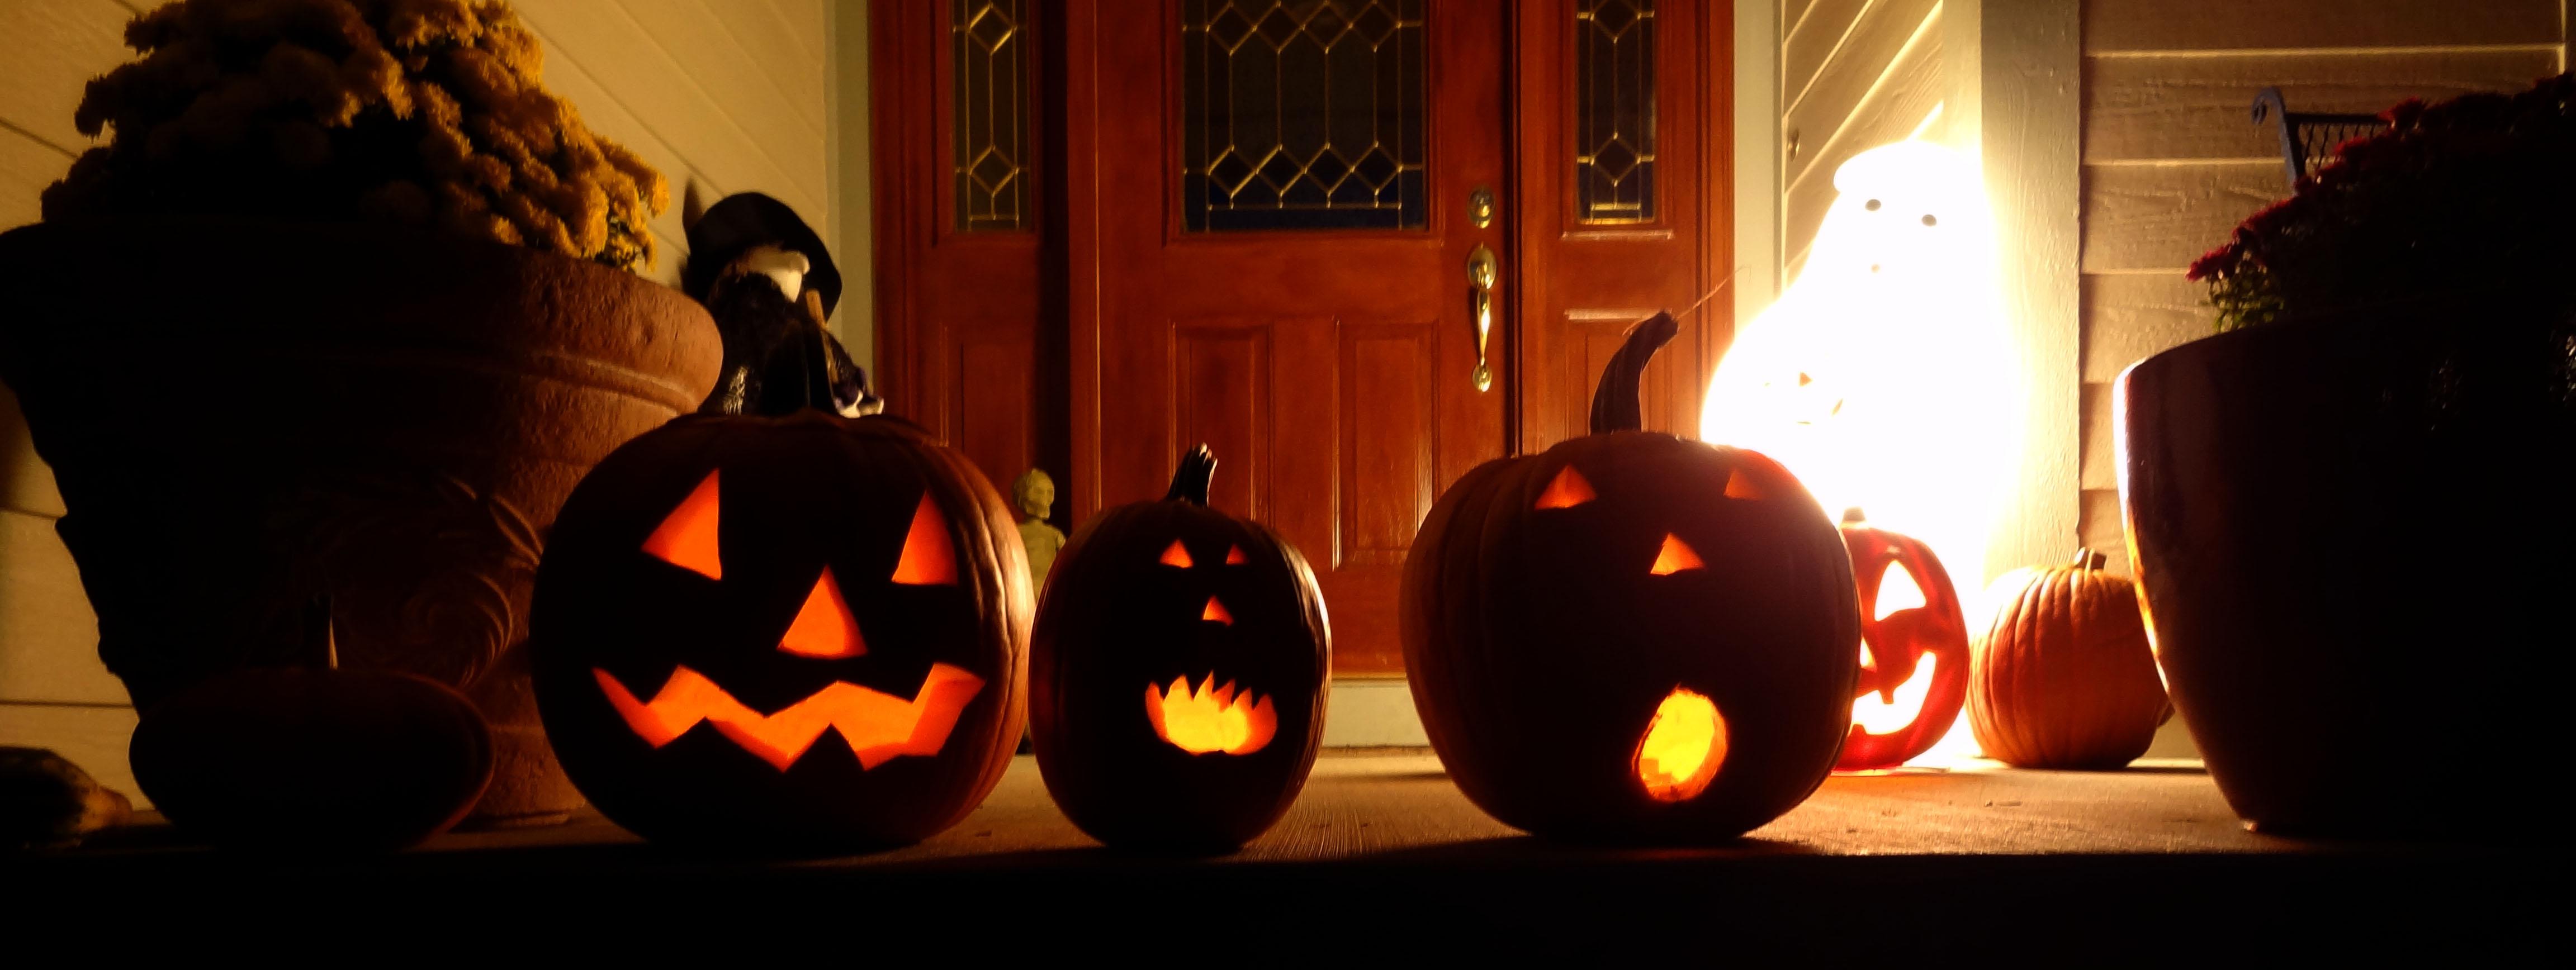 pumpkins row Halloween